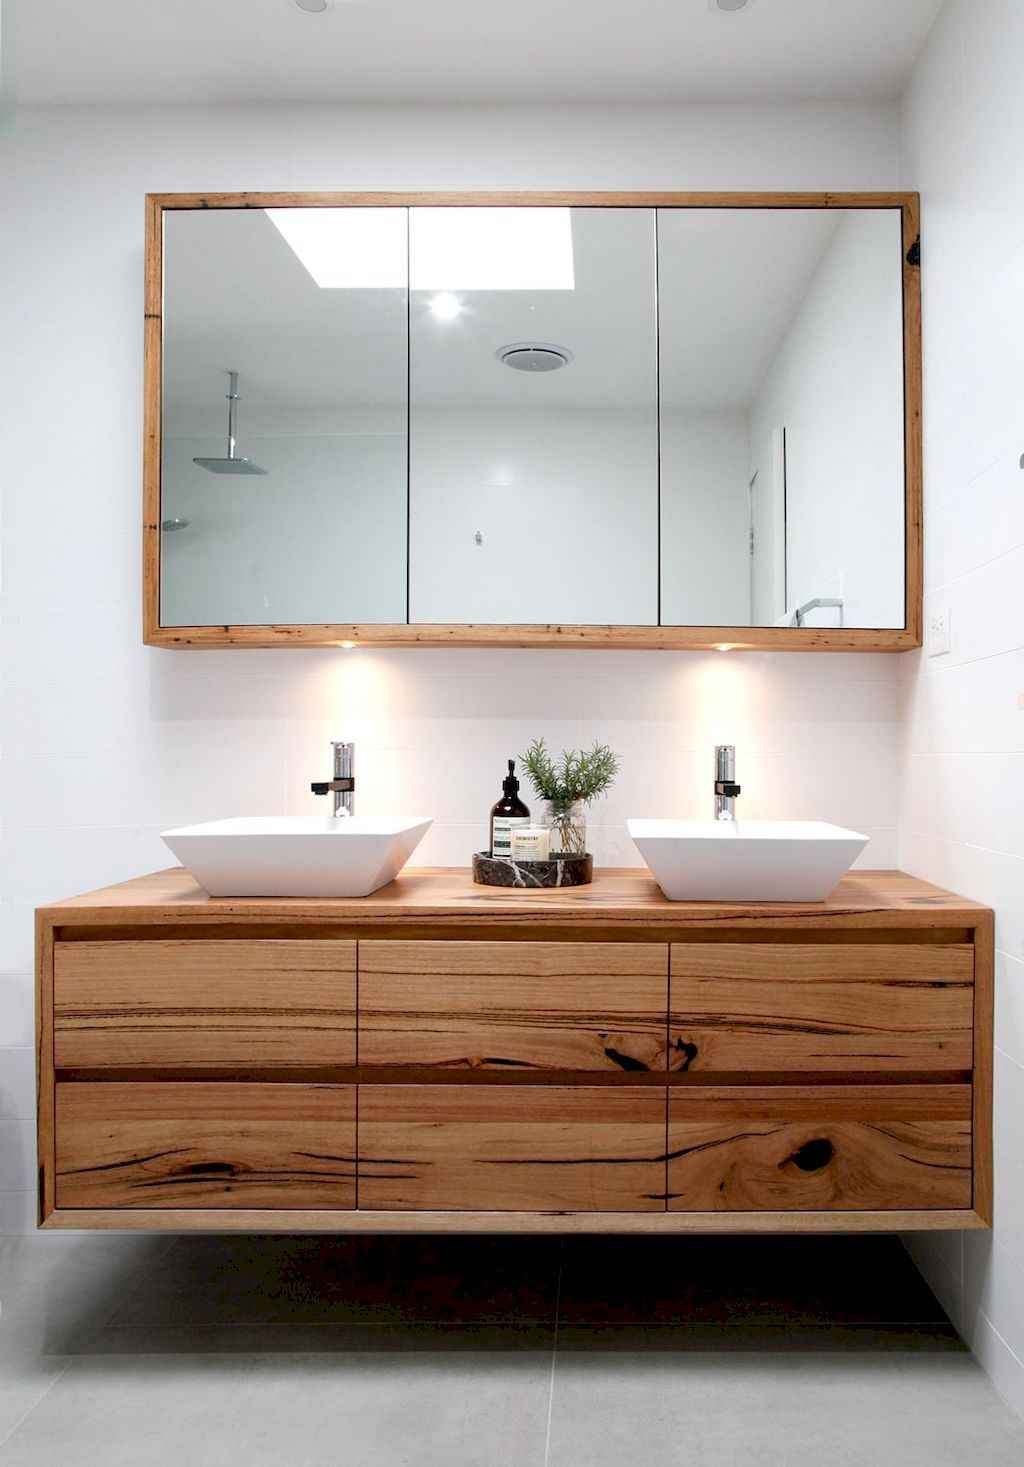 111 Brilliant Small Bathroom Remodel Ideas On A Budget (10)